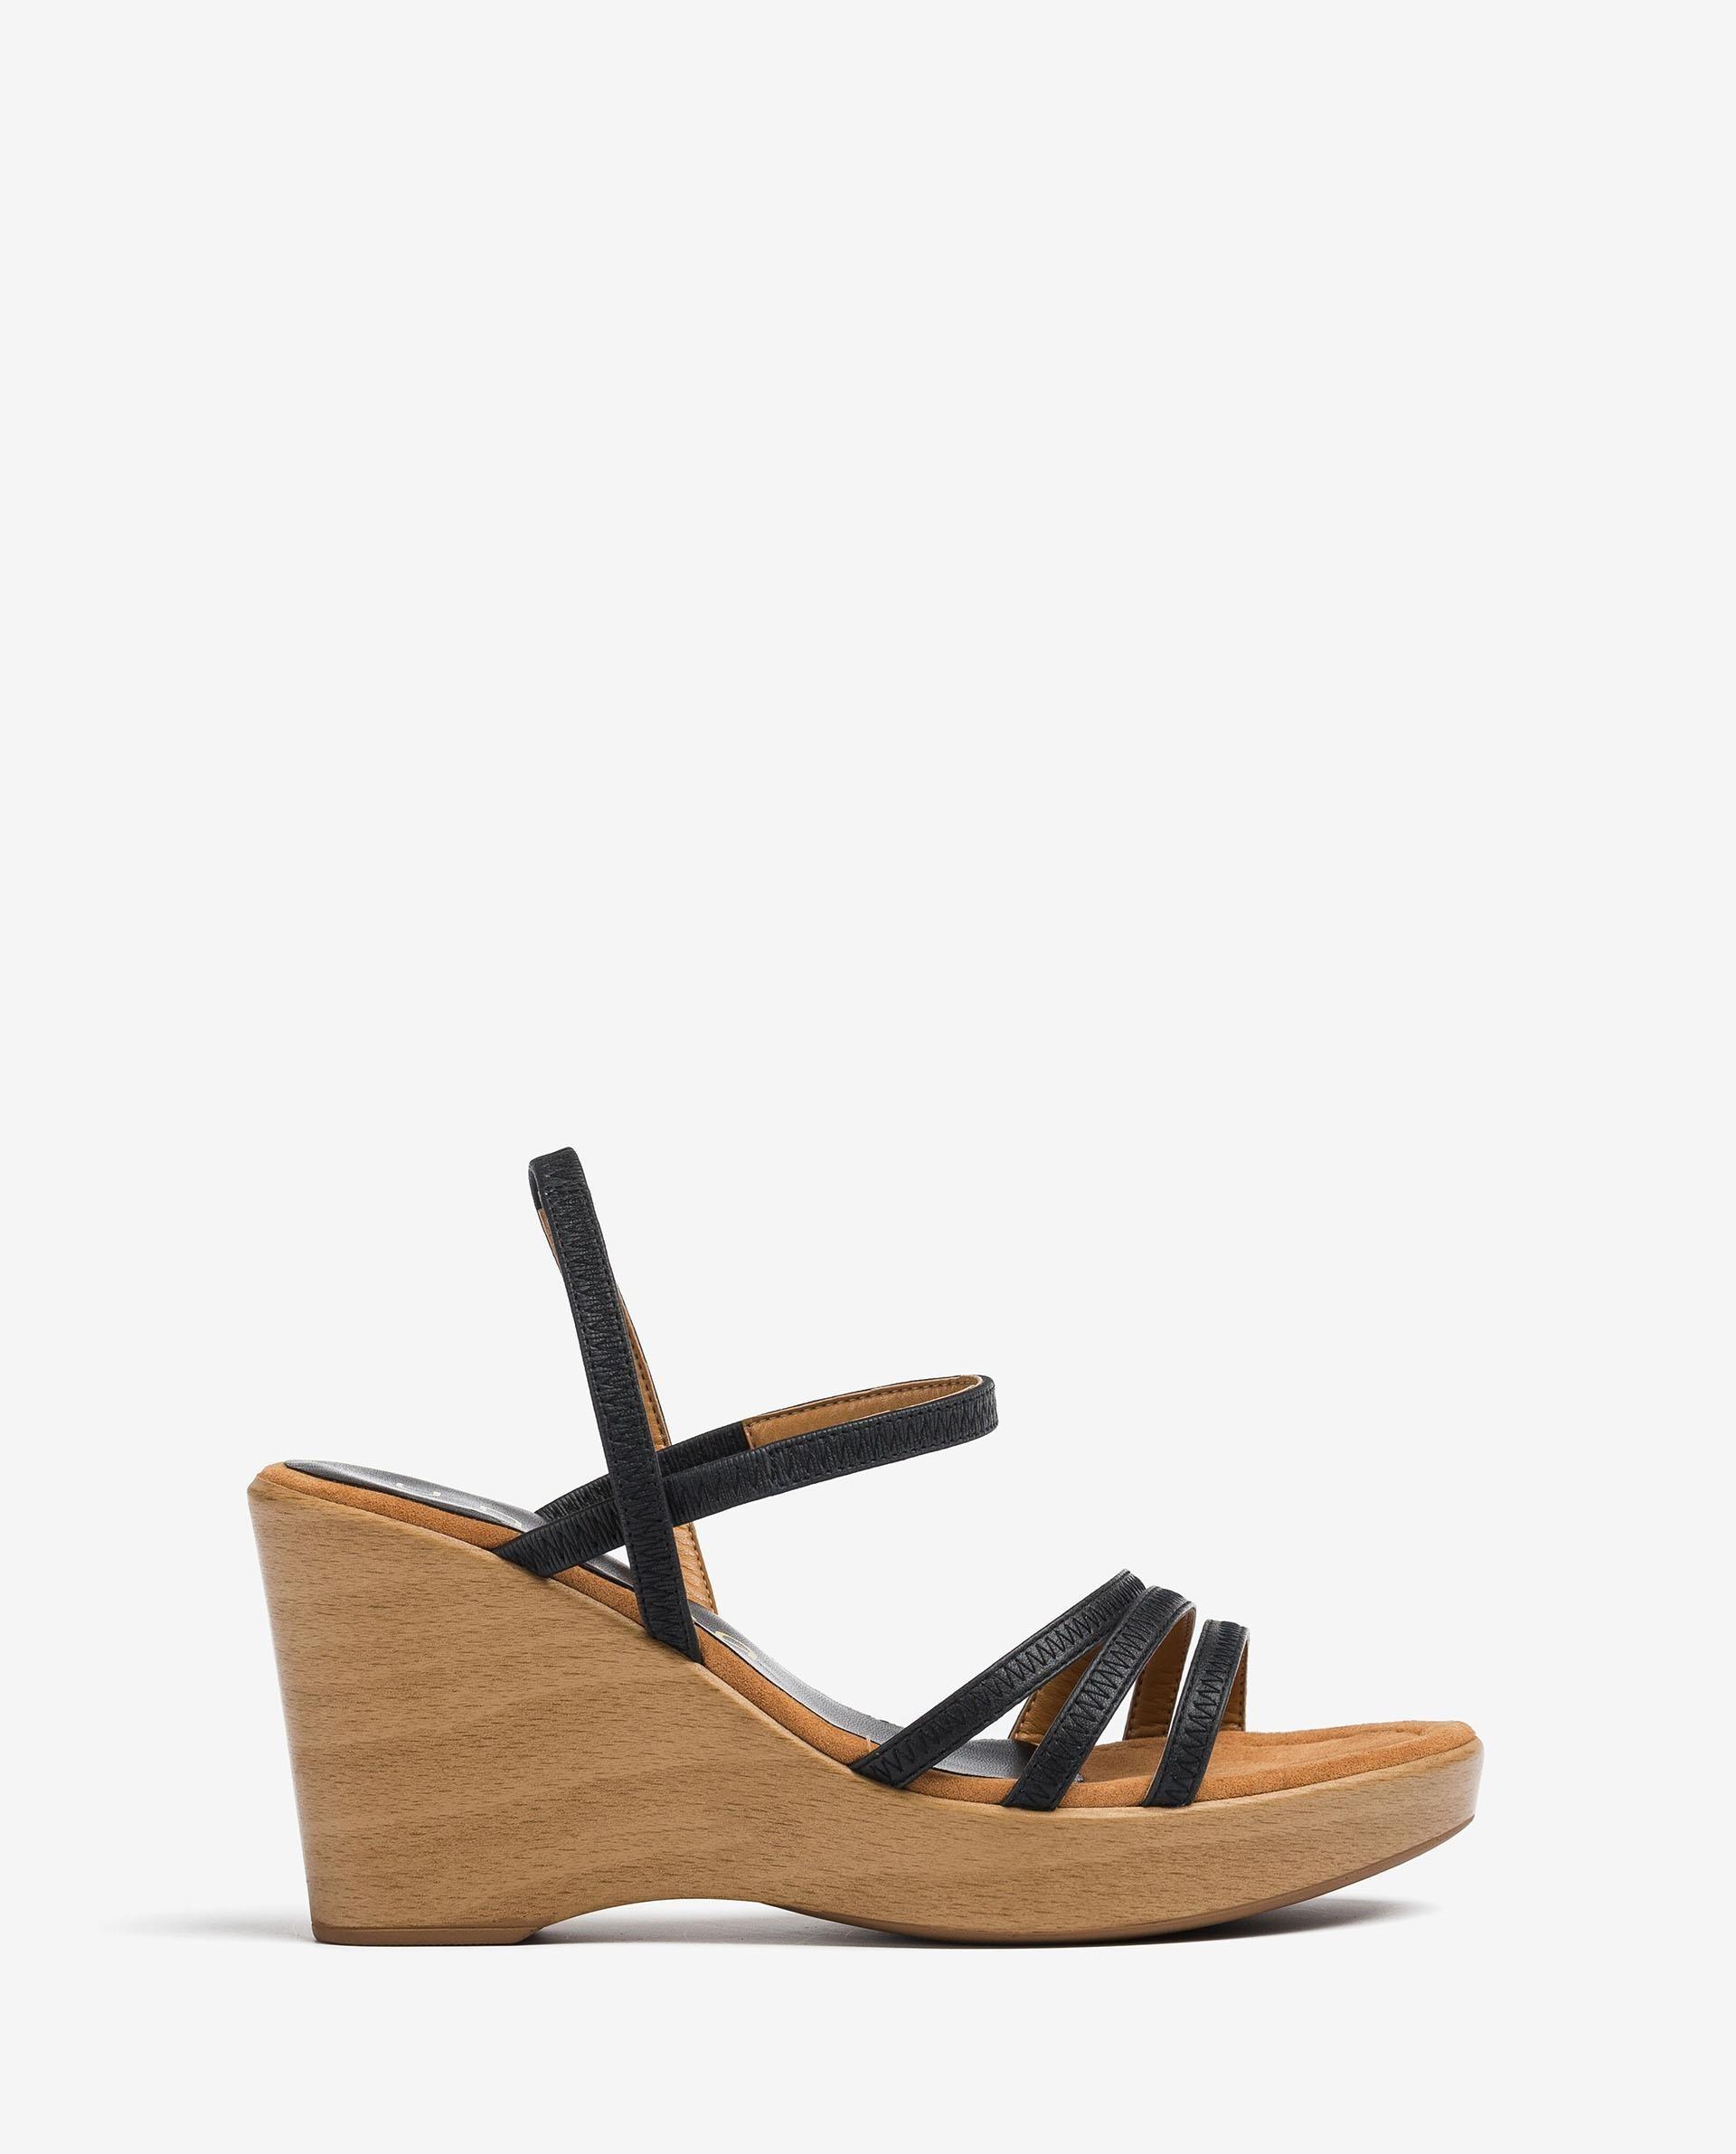 UNISA Multi-strap leather sandals RENERA_NS 2